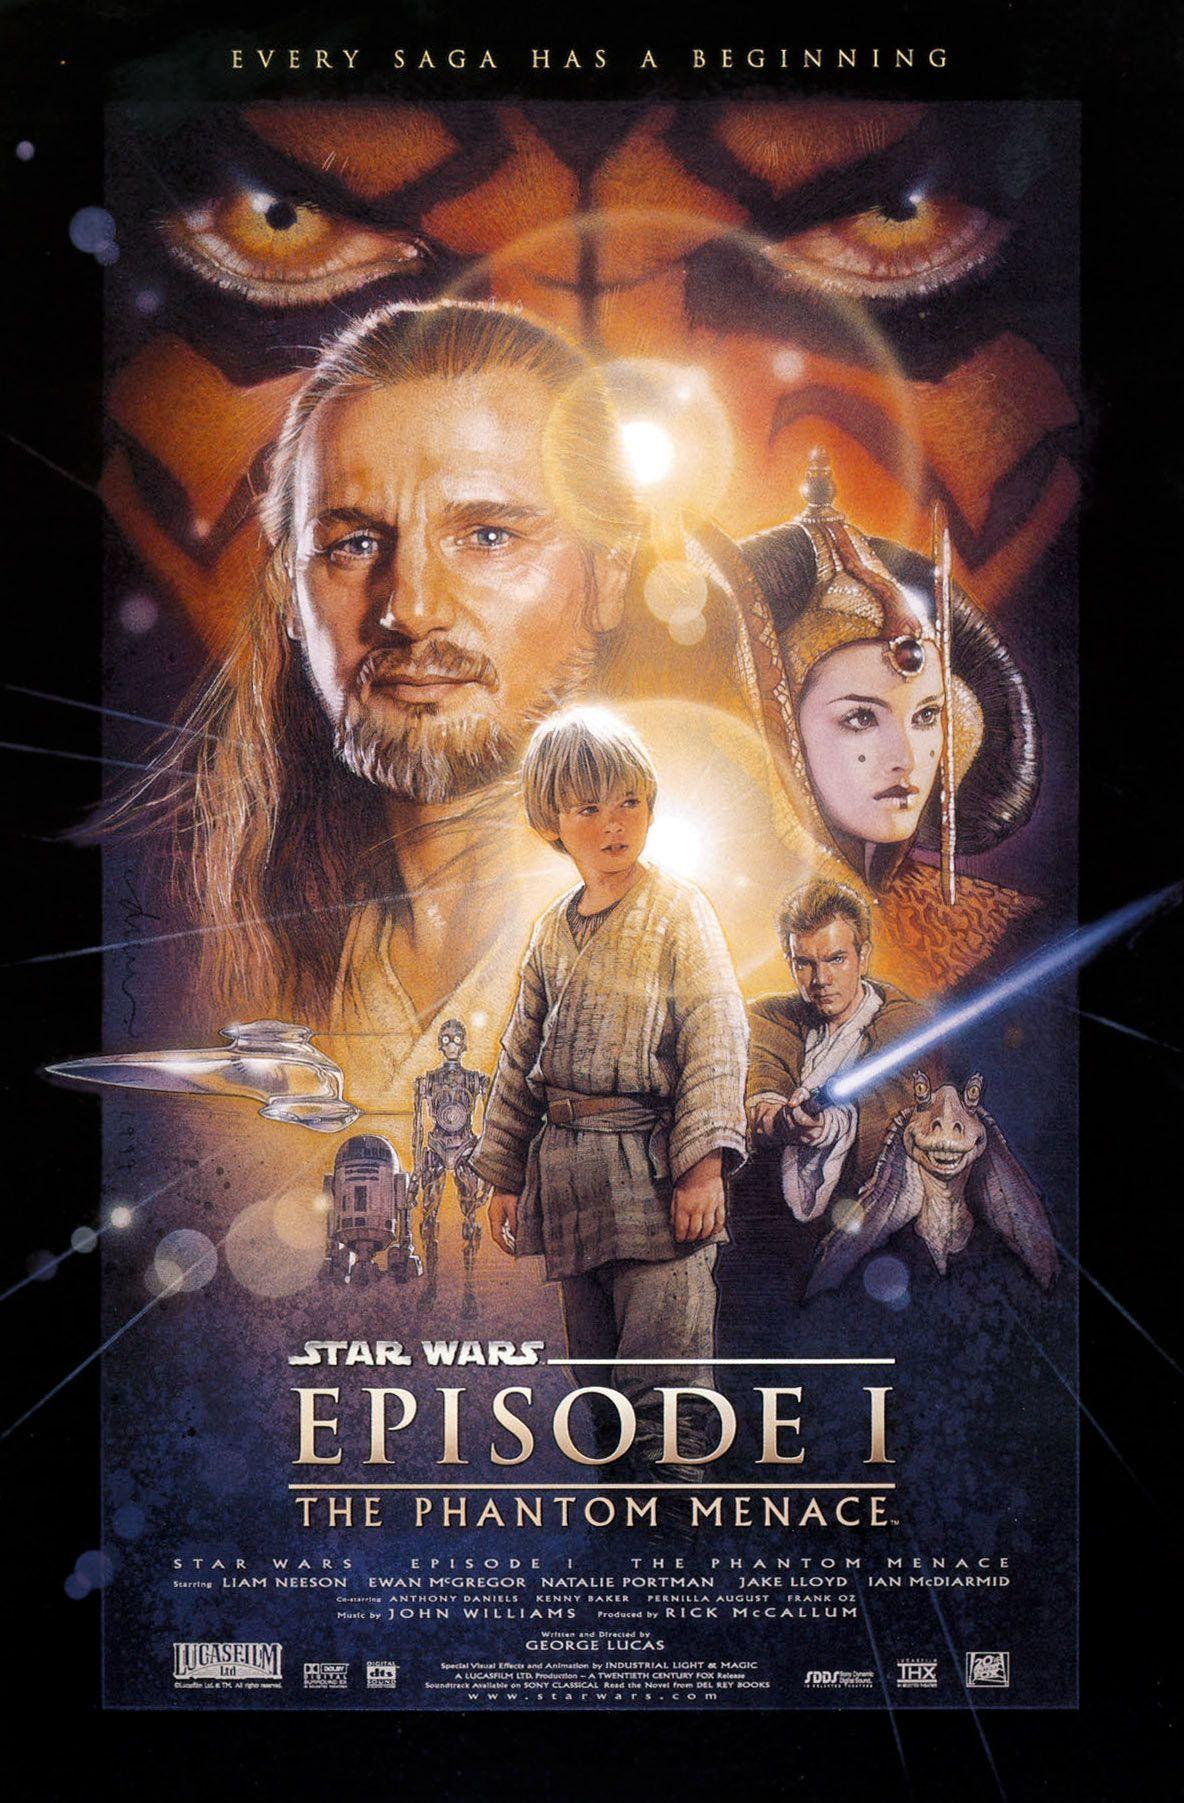 Star Wars Episode I The Phantom Menace Filme Sehen Filmplakate Star Wars